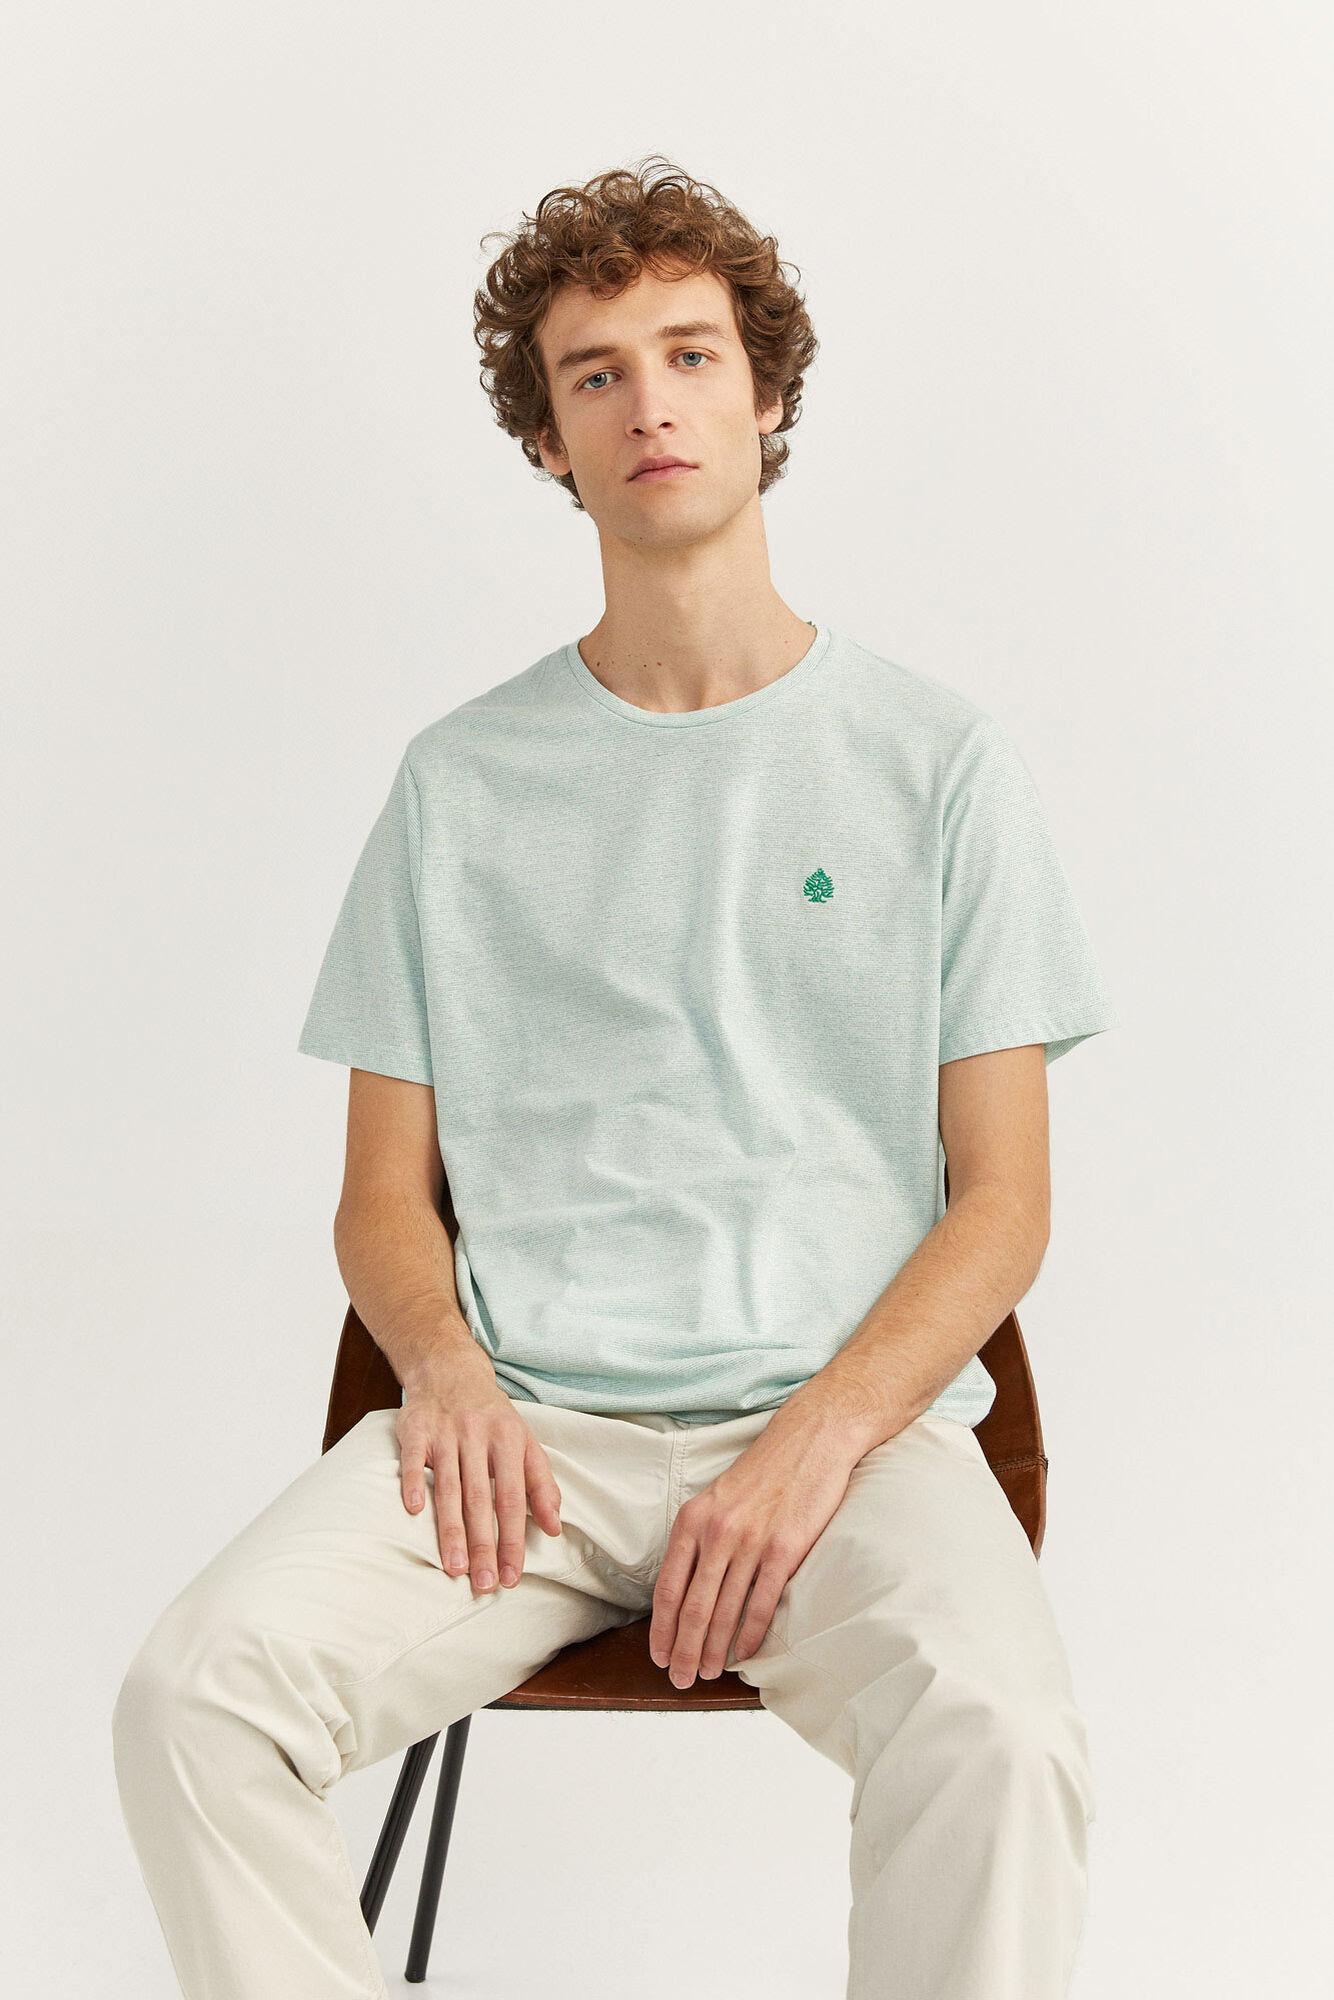 Camiseta de manga corta regular fit con tejido texturado y logo bordado.